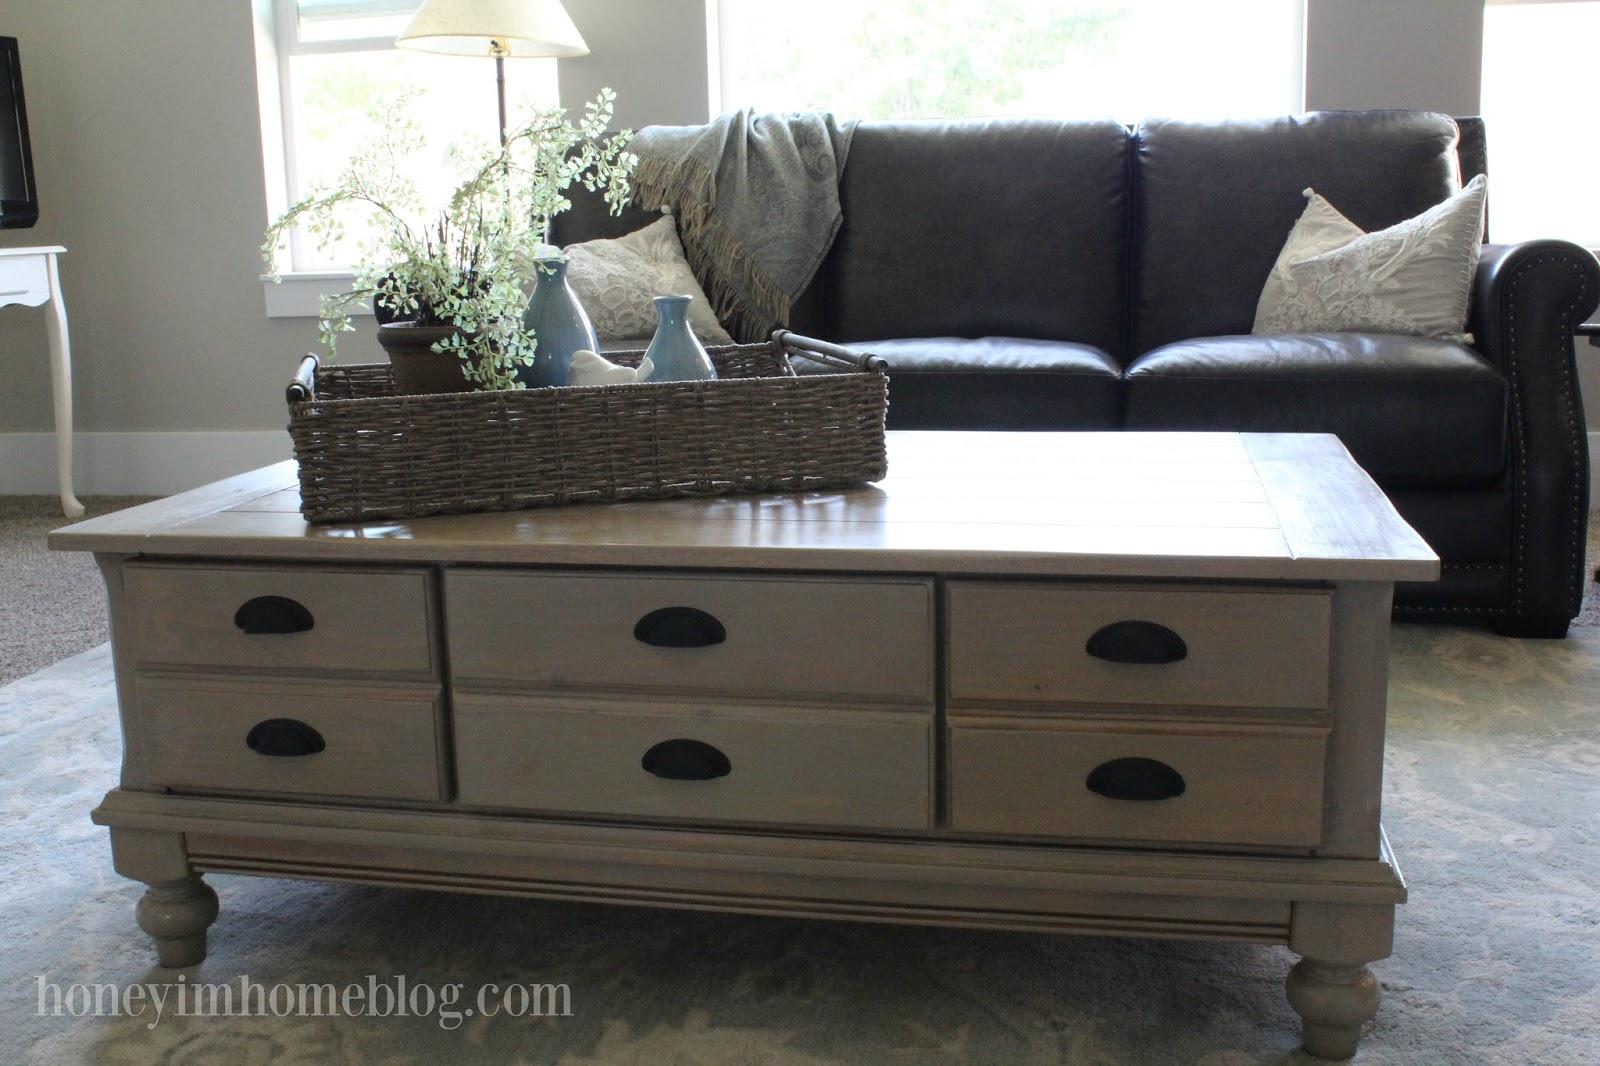 Honey I'm Home: Refinishing A Coffee Table